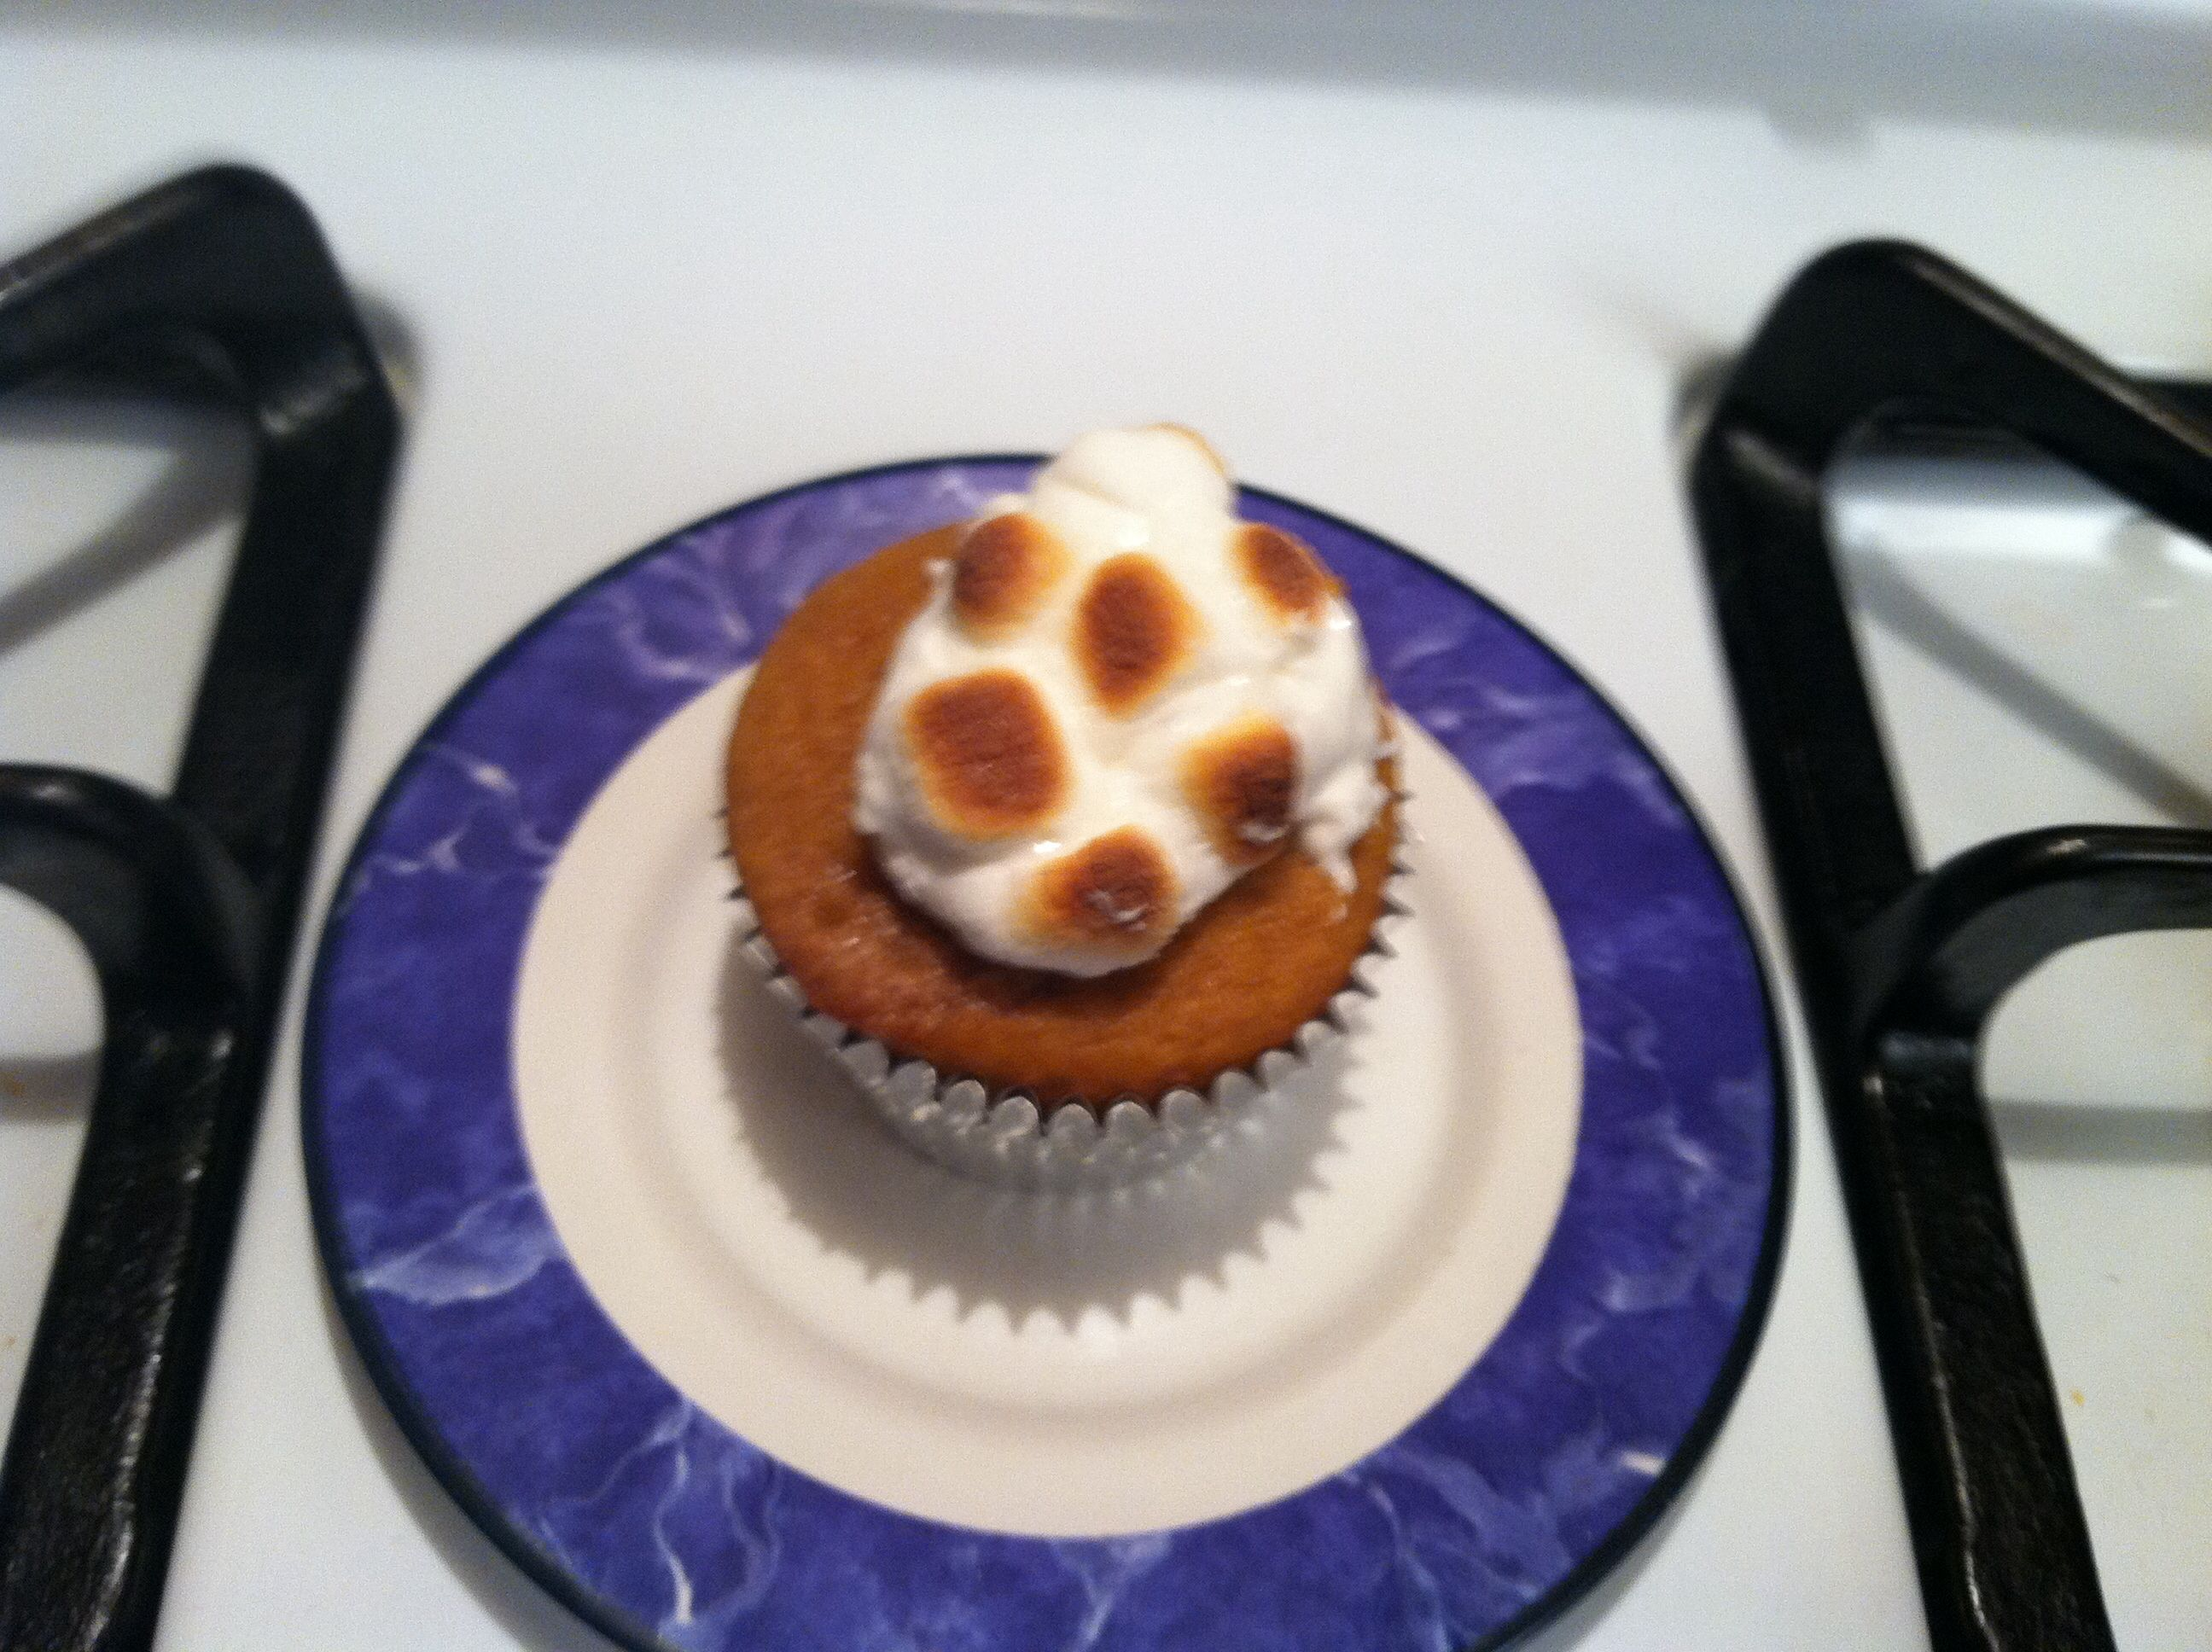 Sweet Potato cupcake w/ toasted marshmallow topping